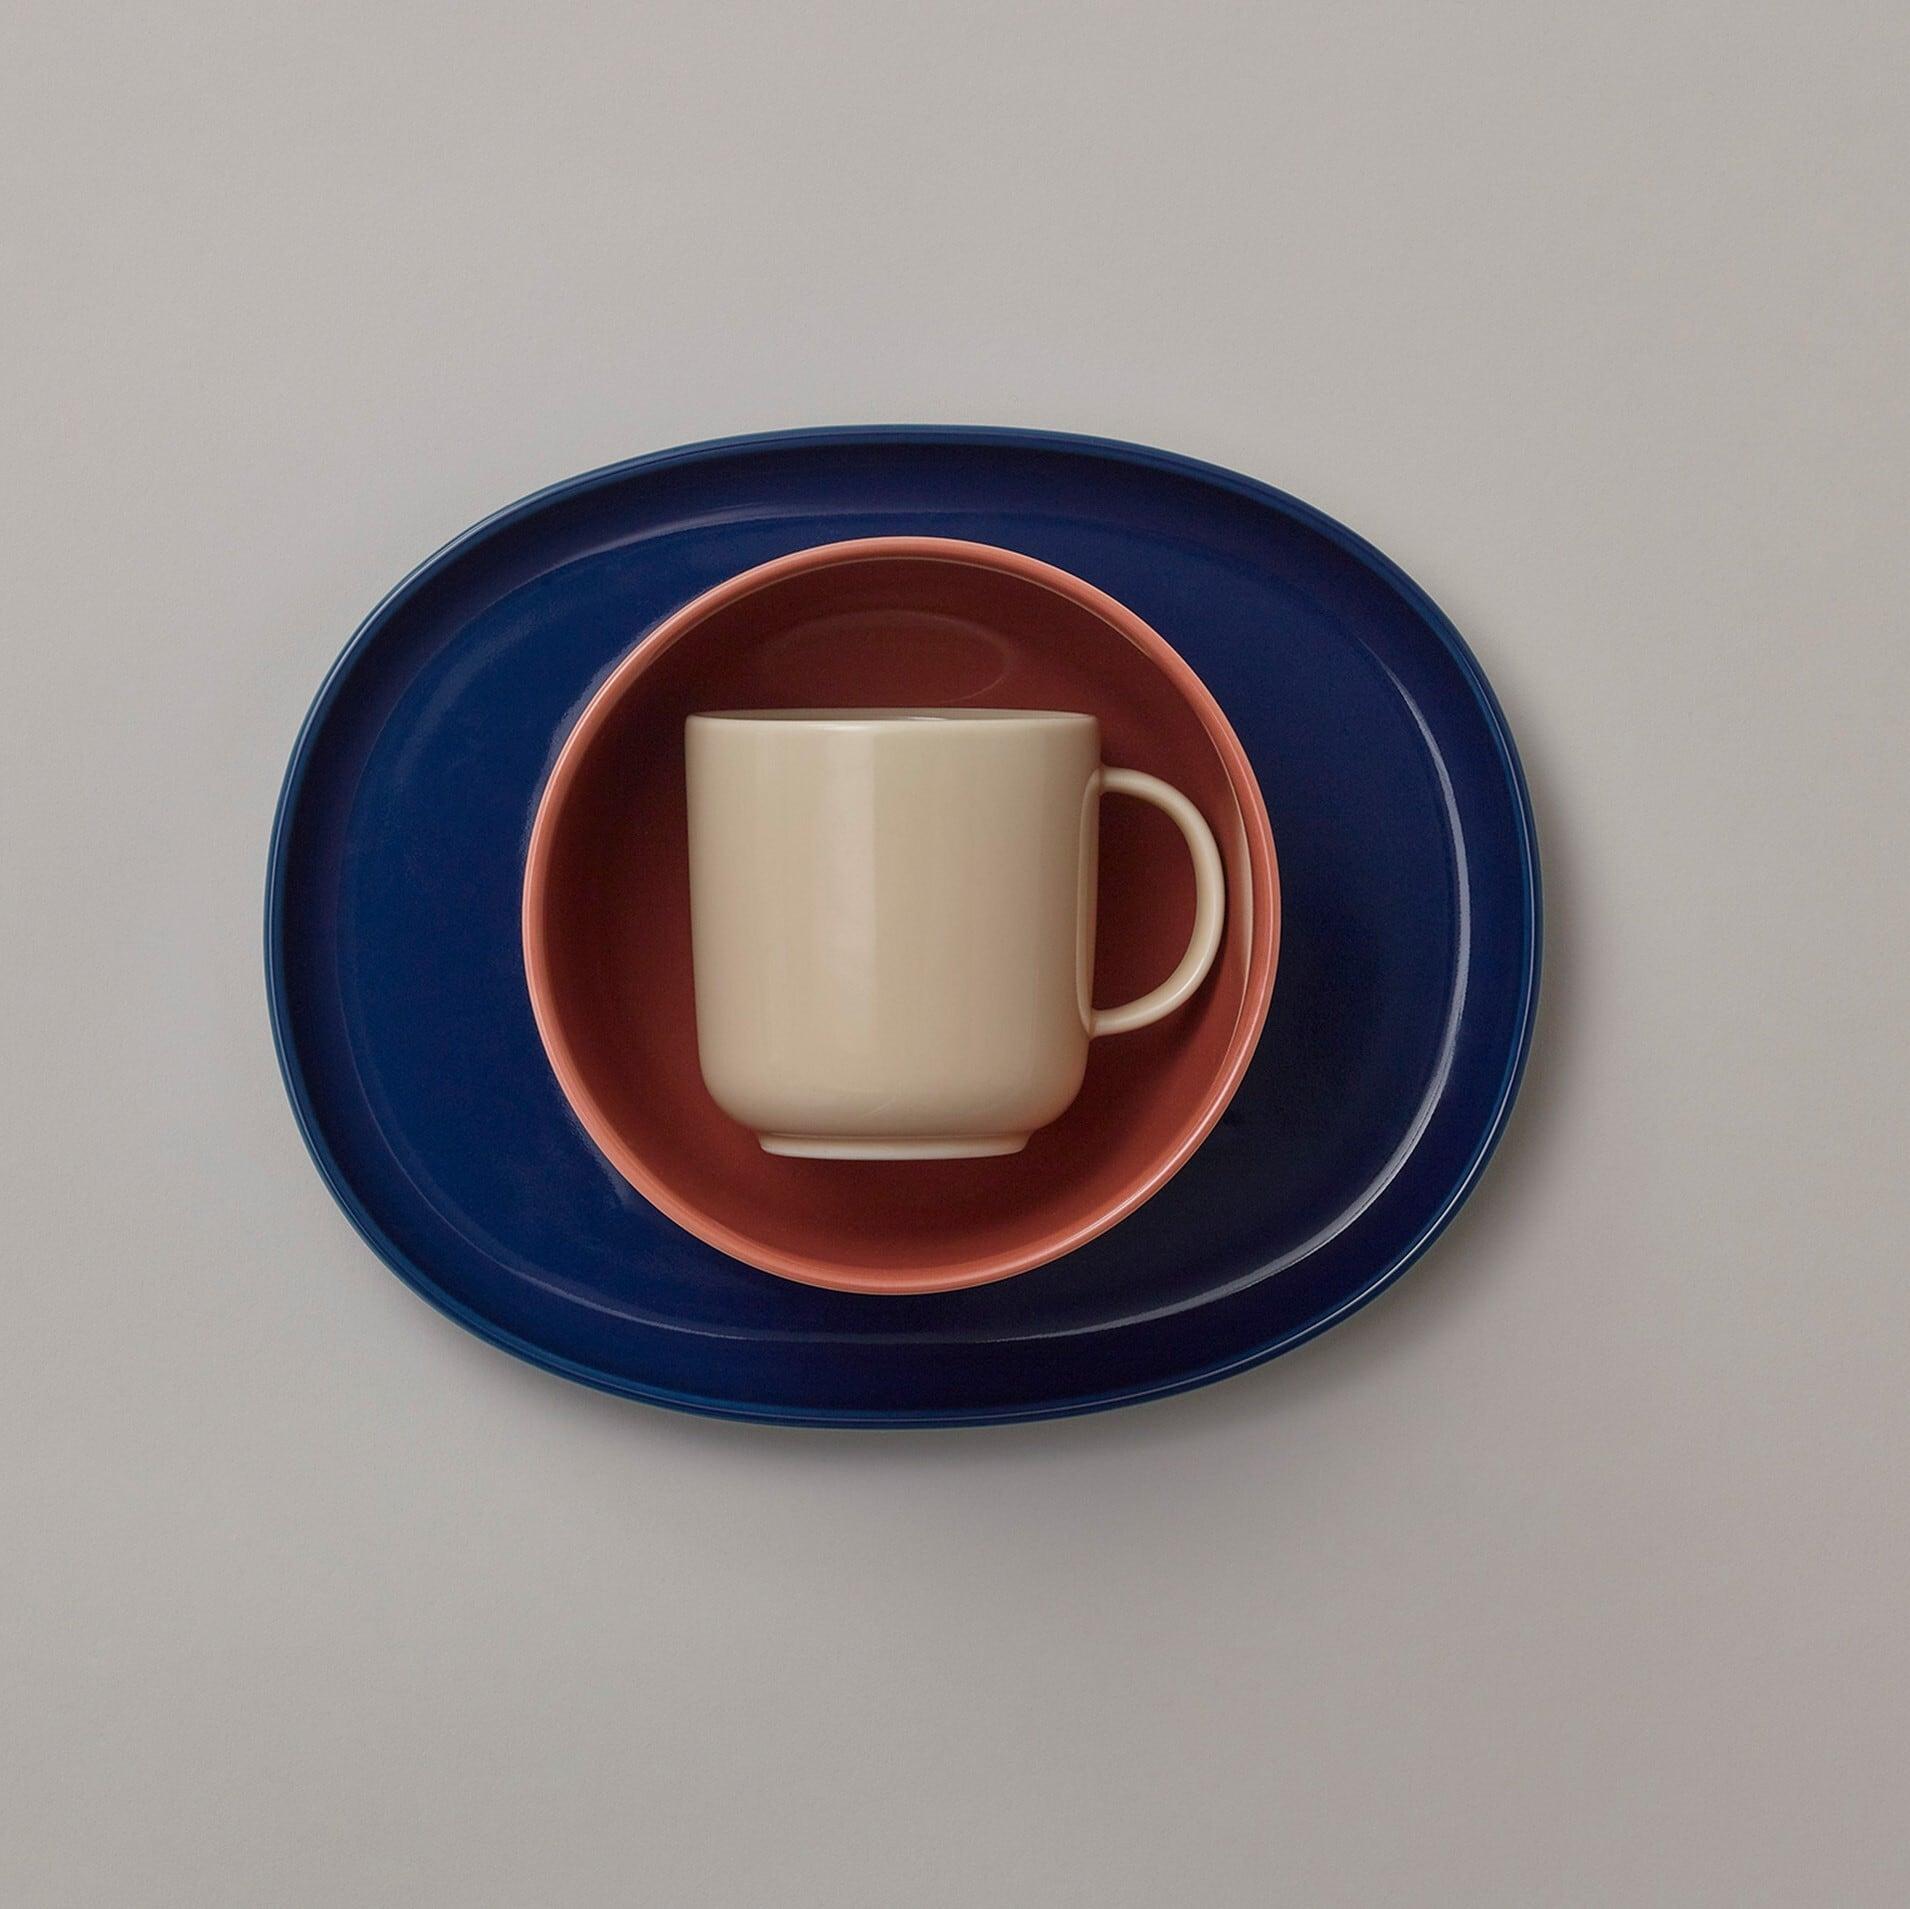 NUPPU(ヌップ) JUNIOR Tableware set (テーブルセット) Berry Smoothie (ベリースムージー)